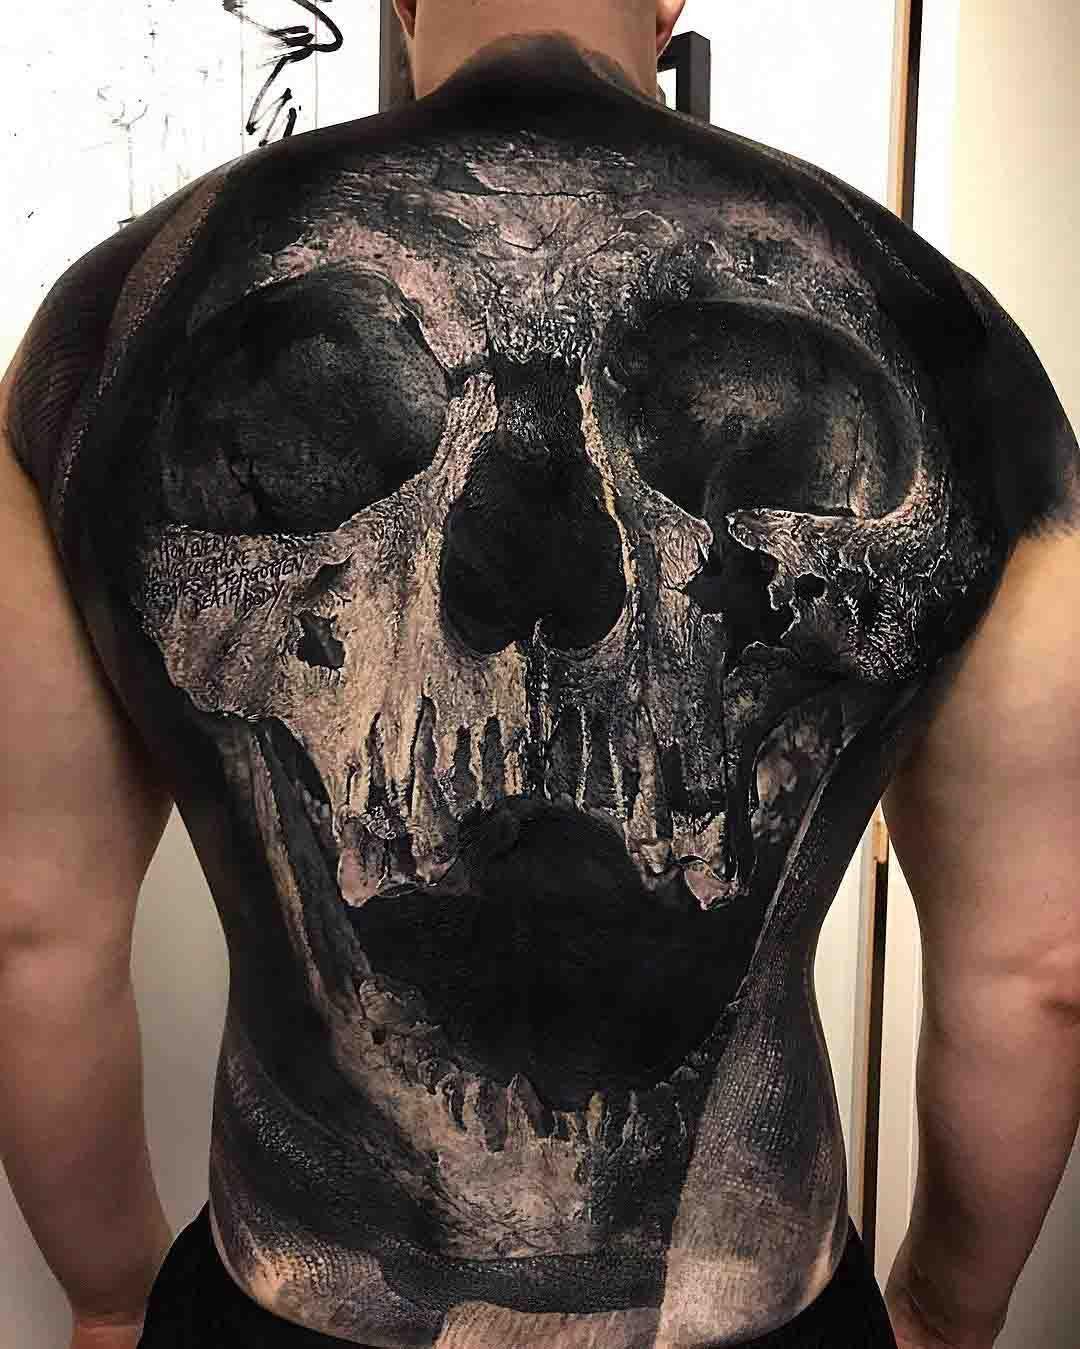 Grey Skull Tattoo On Full Back Awesome Tattoos Pinterest